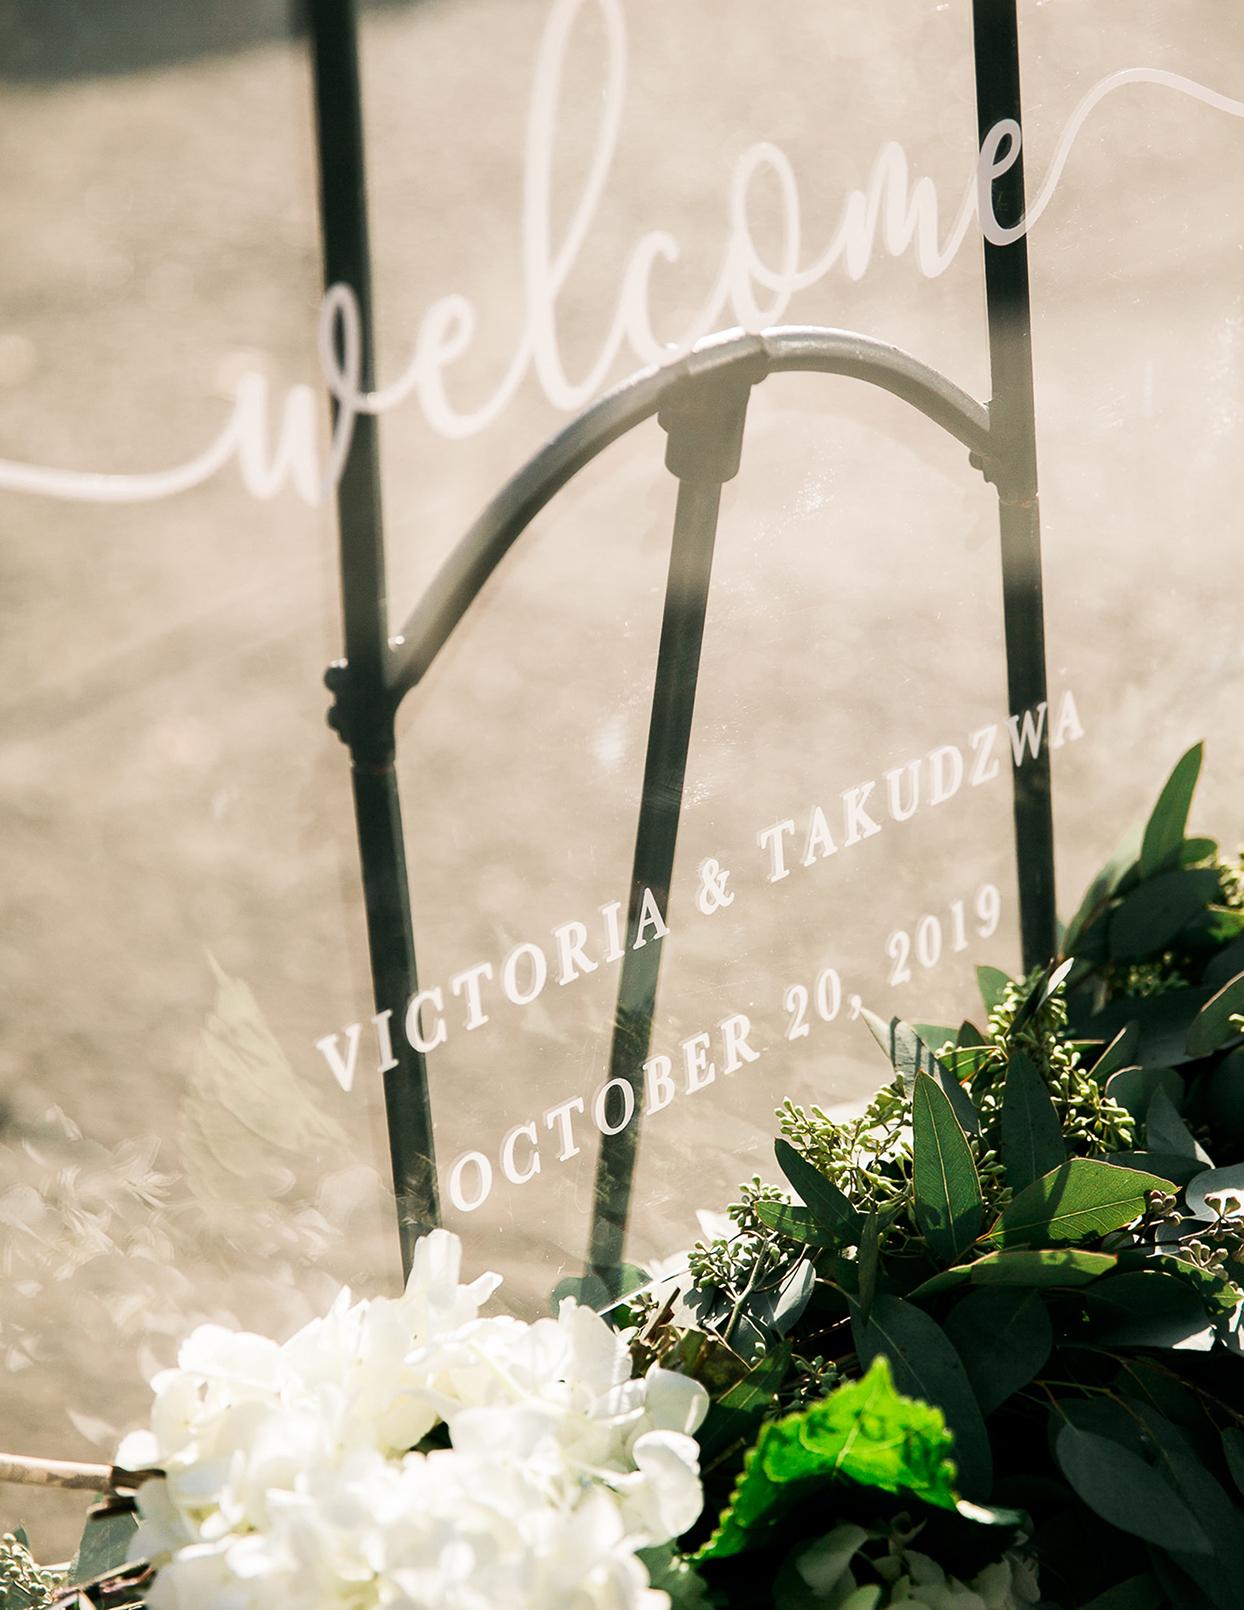 victoria tk wedding glass sign